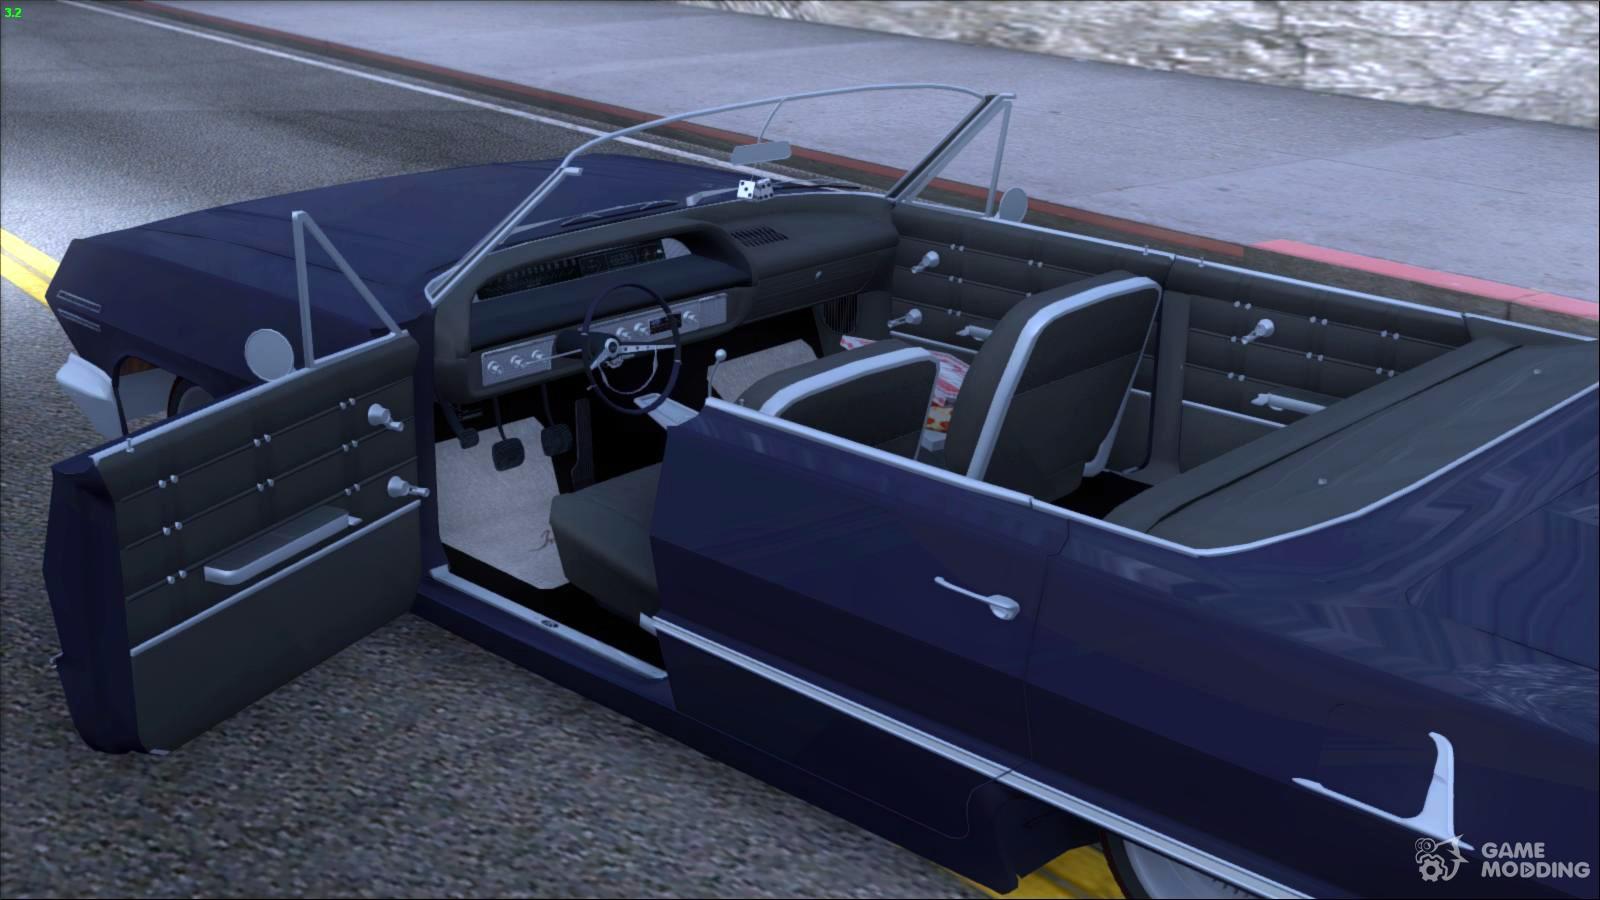 Chevrolet impala 4 door hardtop 1963 for gta san andreas - Chevrolet Impala 1963 For Gta San Andreas Inside View